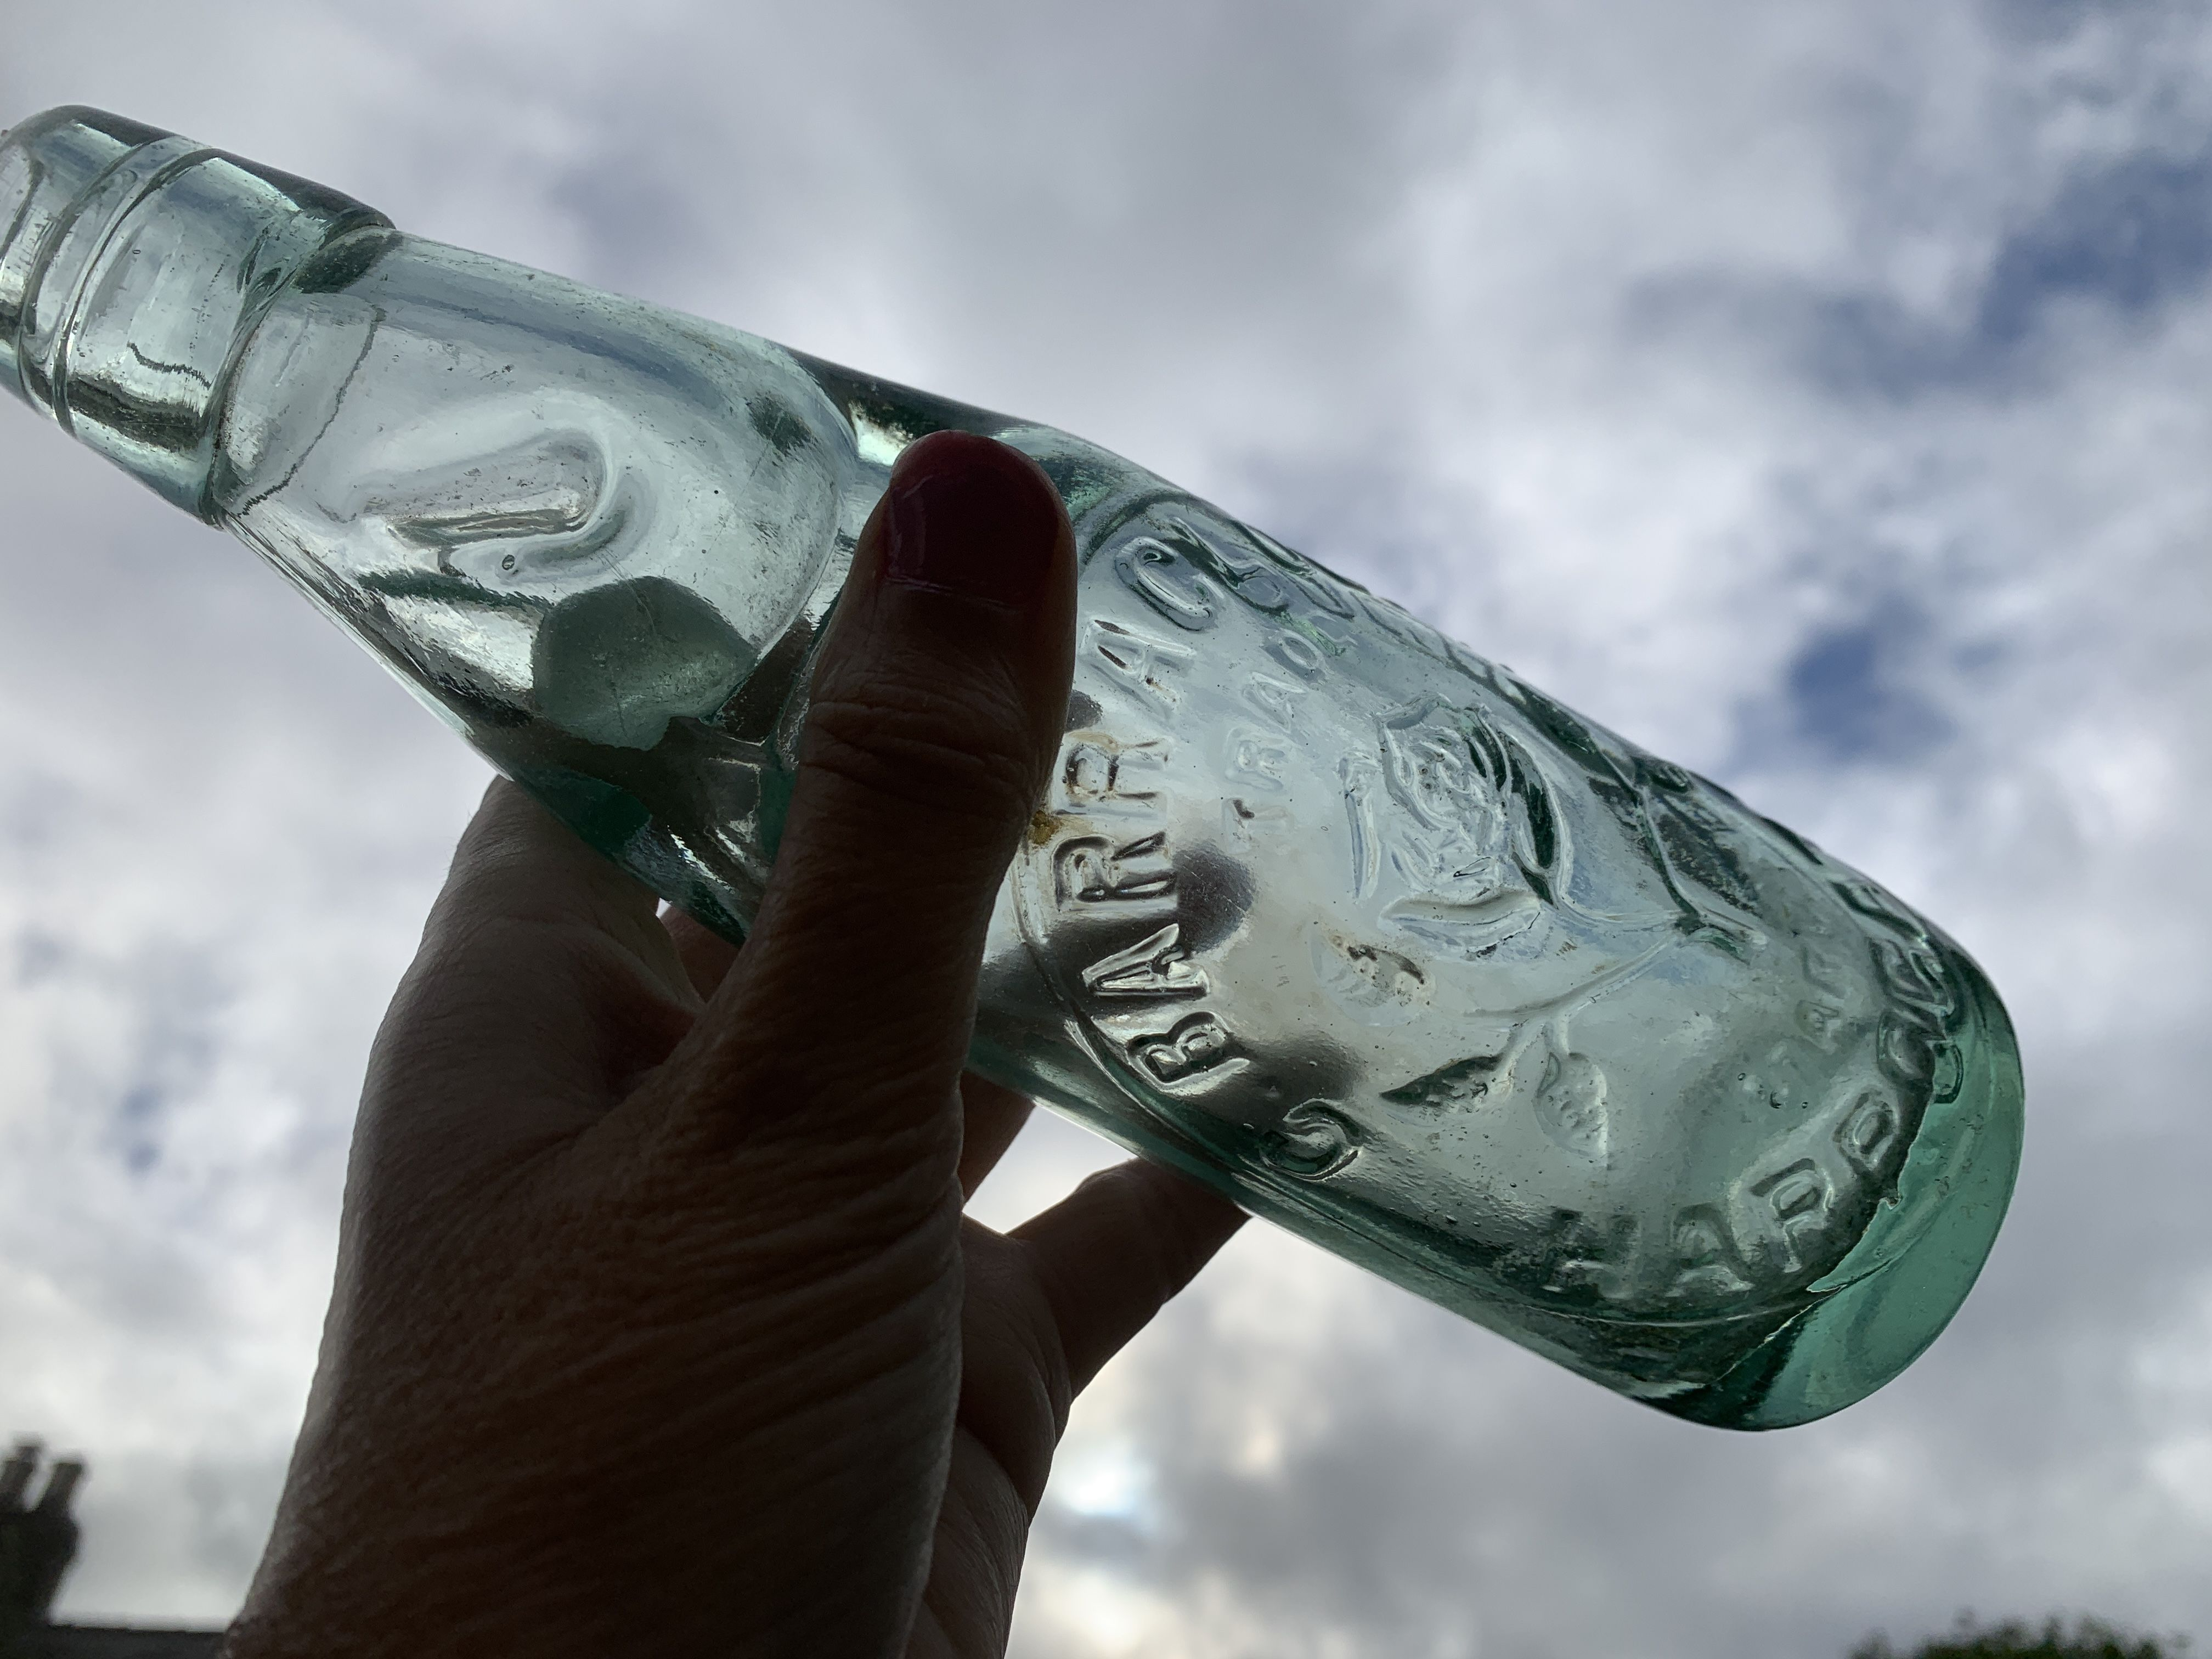 Antique Victorian Glass Marble Bottles Mineral Water Yorkshire England Bottle Antique Glass Bottles Bottle Manufacturers